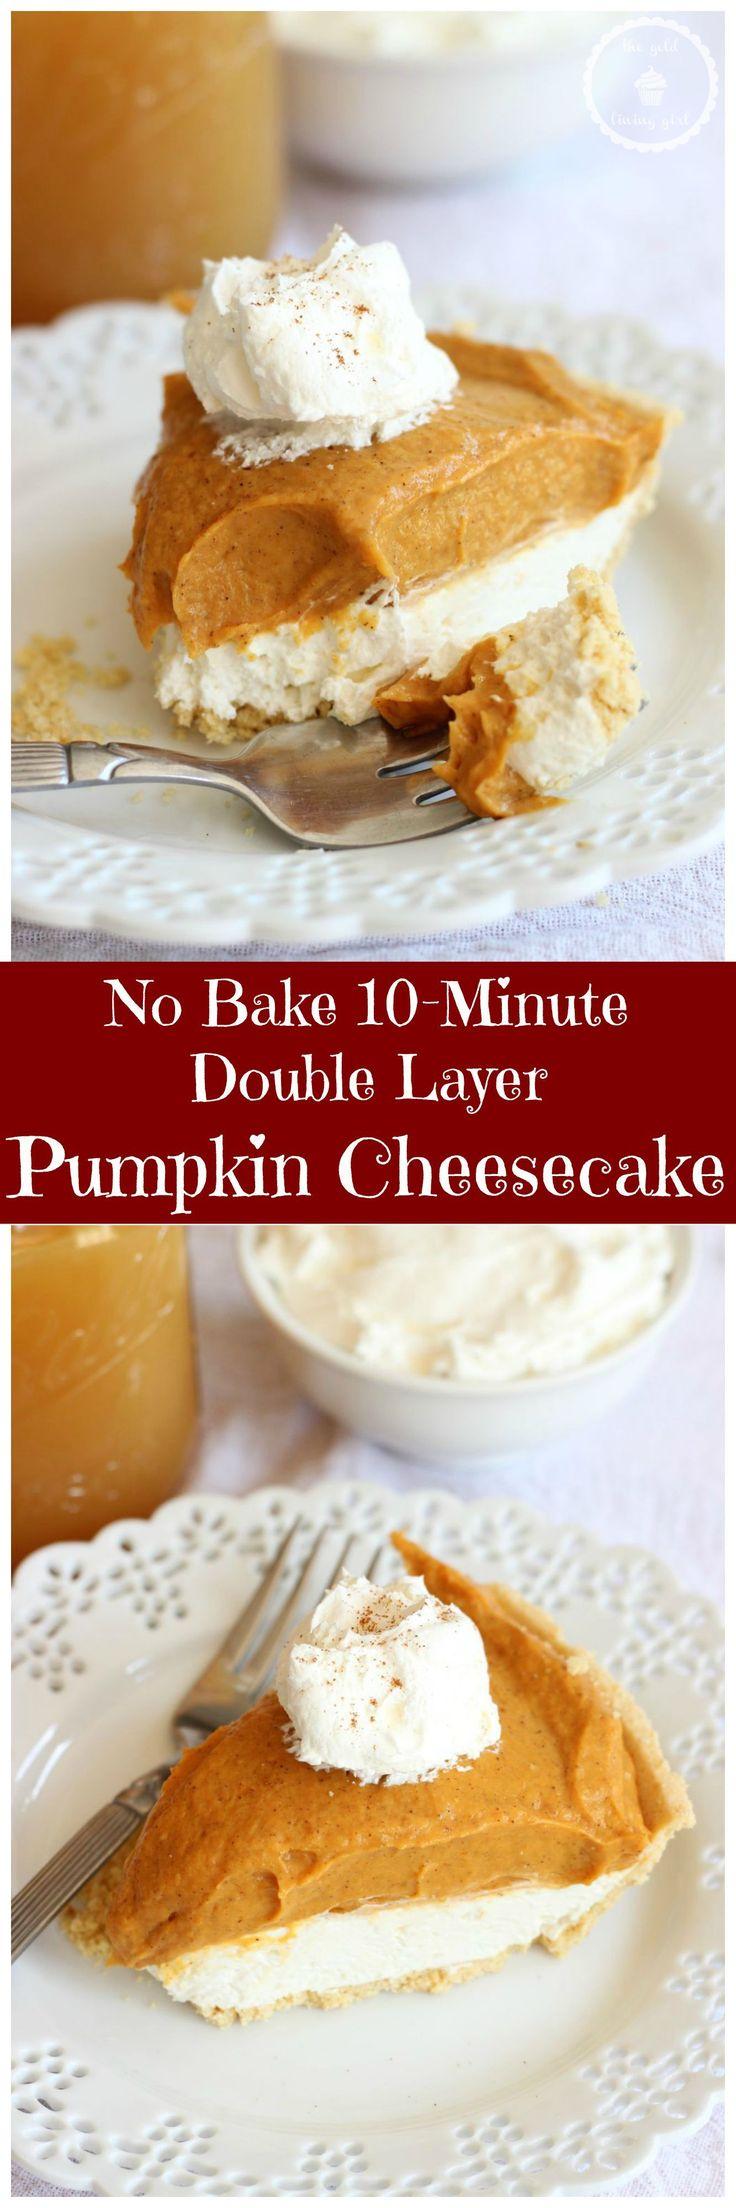 Double Layer No Bake Pumpkin Cheesecake